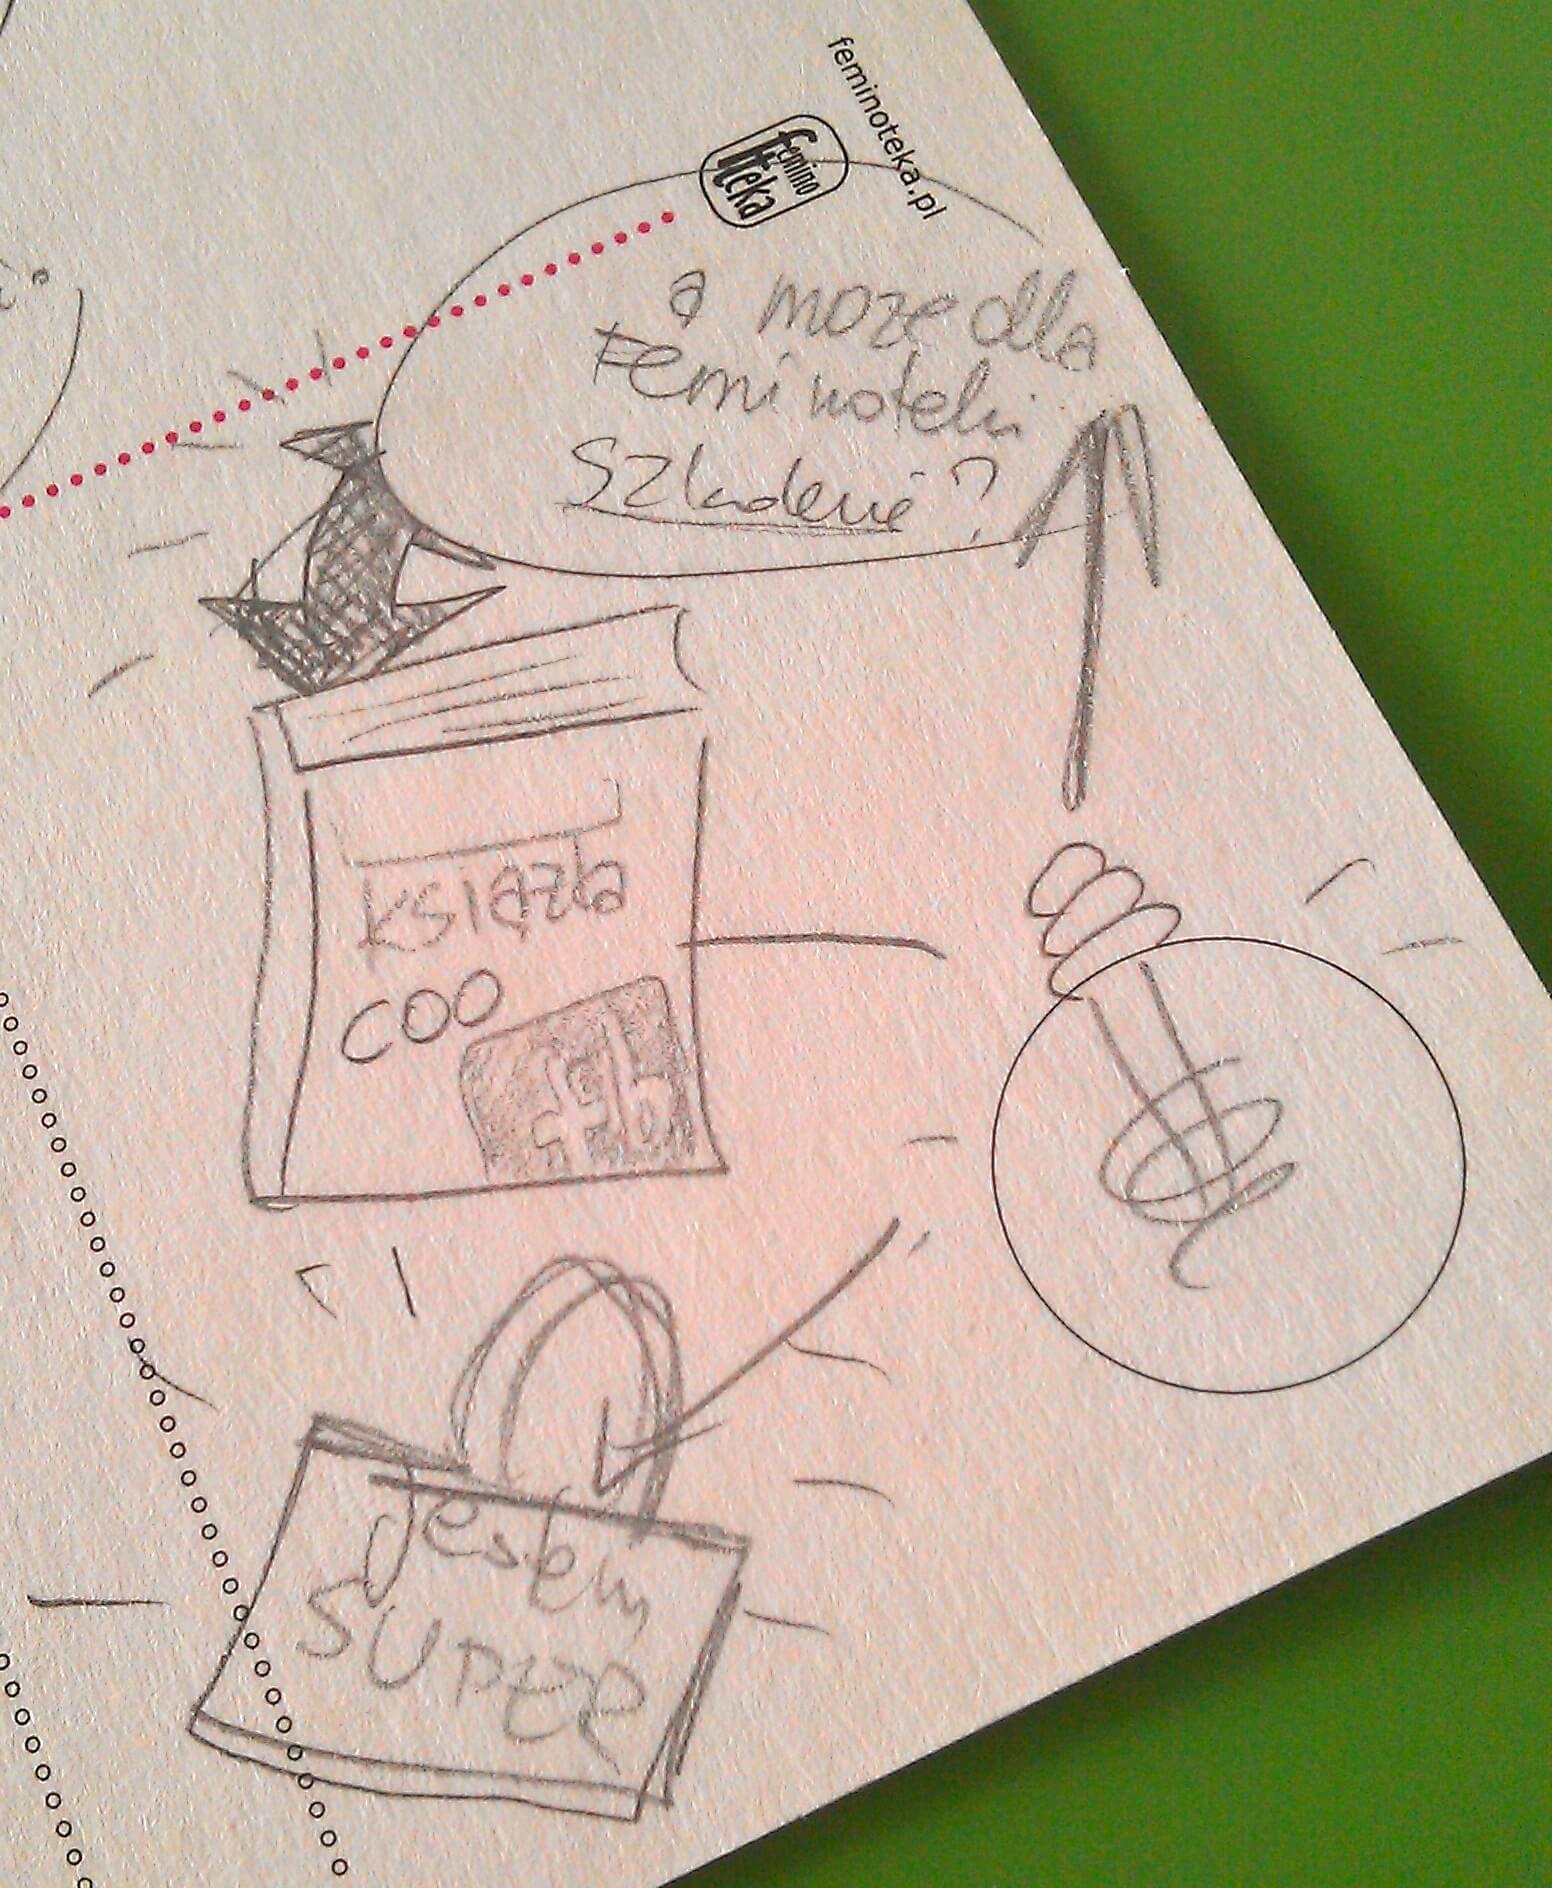 Feminoteka - moje rysunkowe notatki na szybko